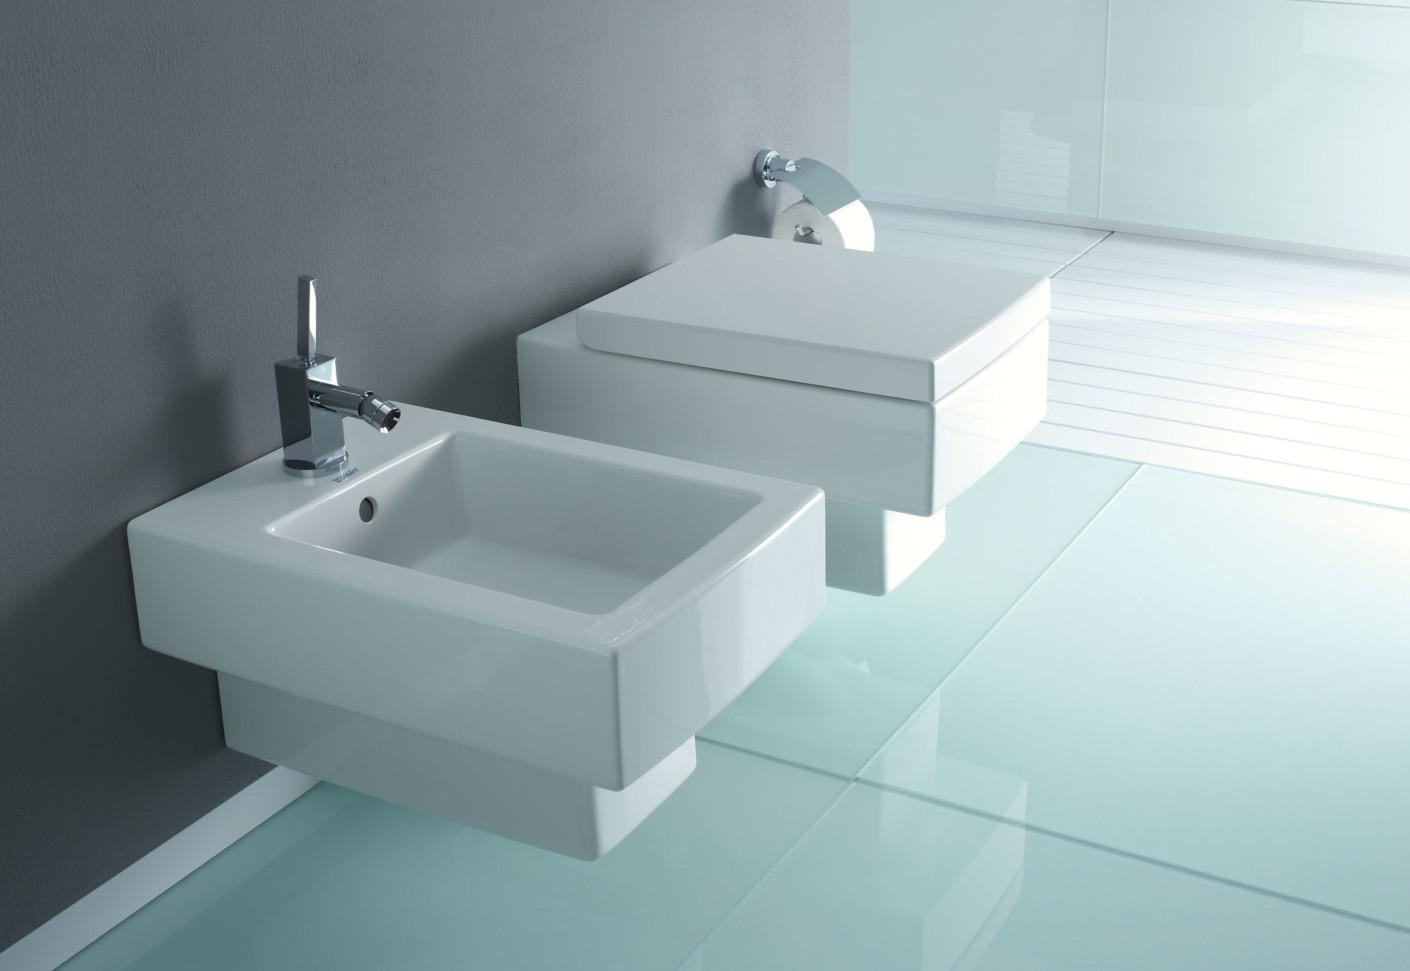 Durovit. Cozy White Duravit Toilet With Bathroom Tissue And Graff ...